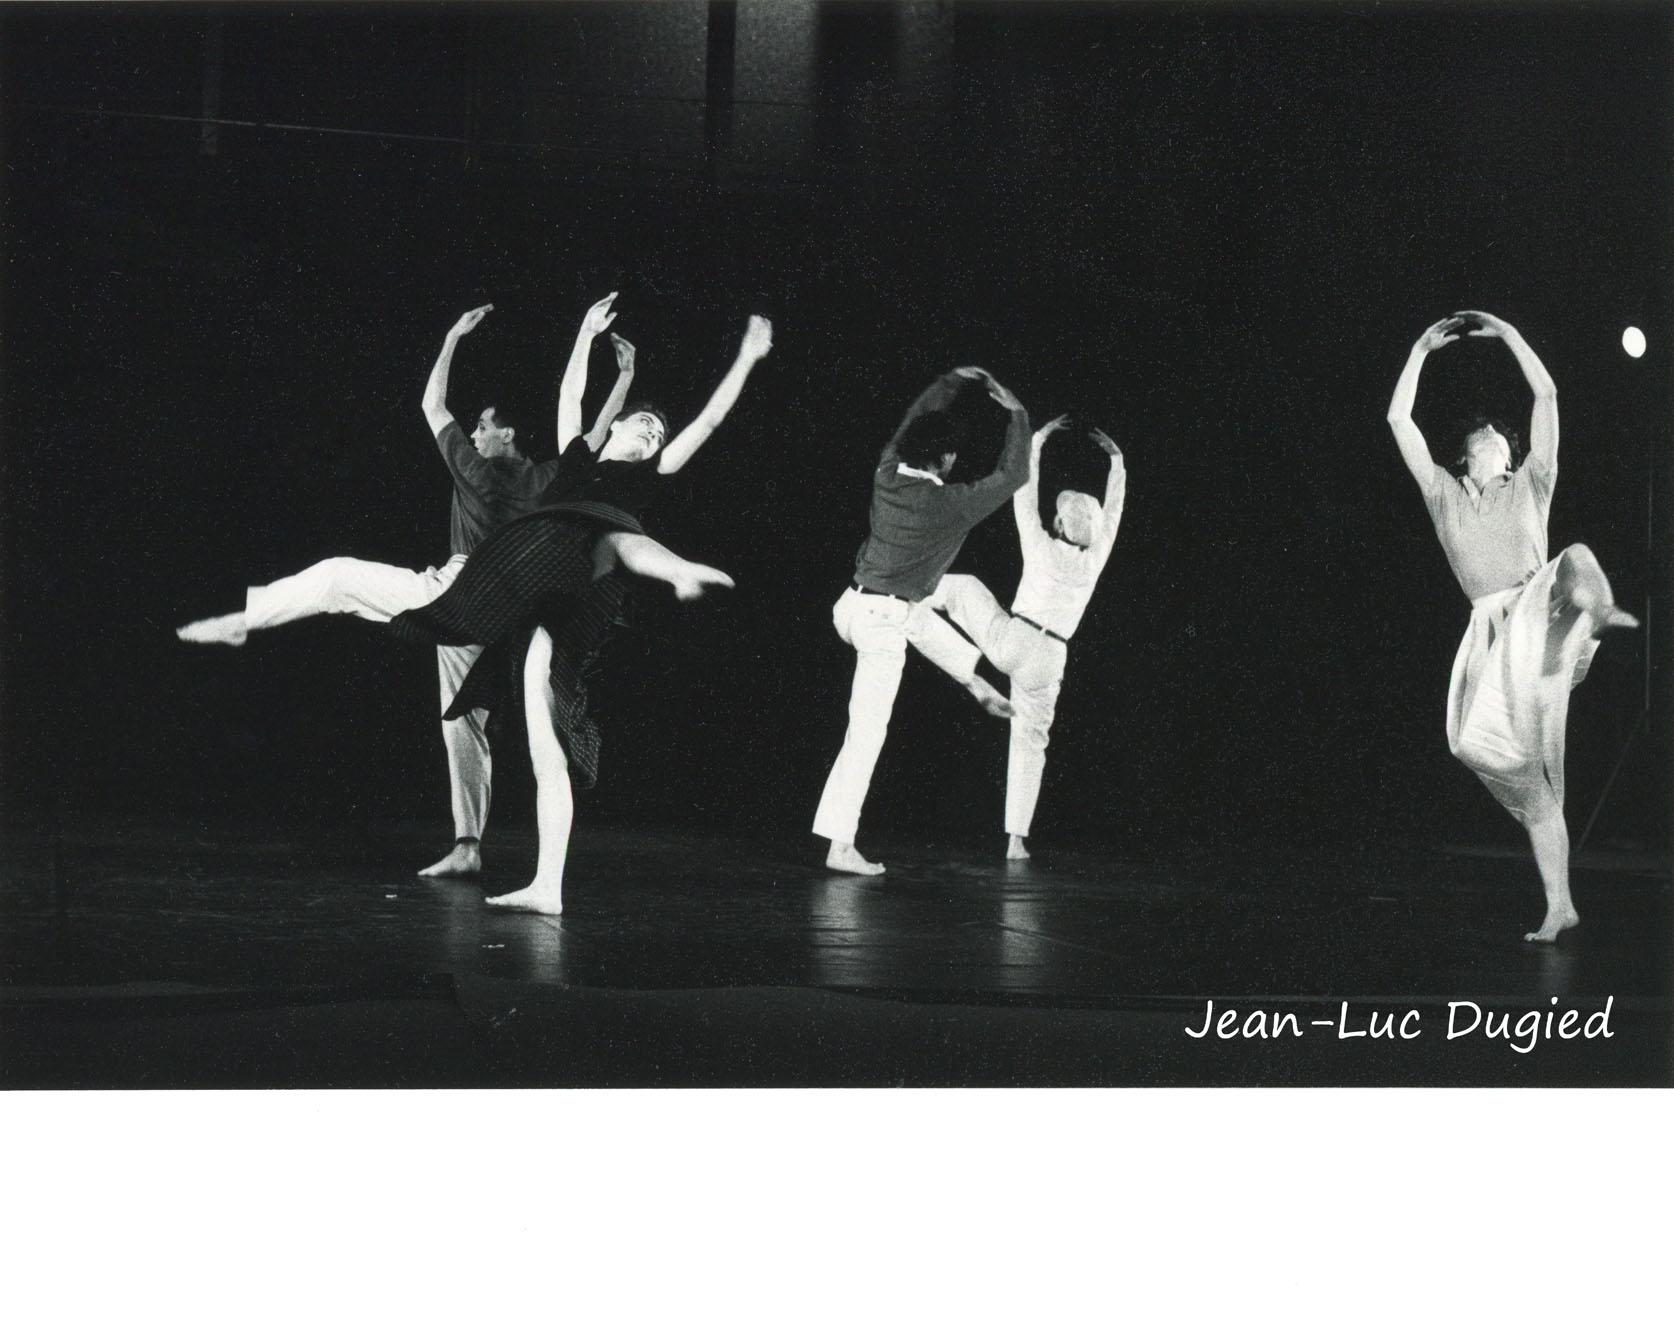 25 Dugied Fabrice - au fond du green l'équilibre - 1987